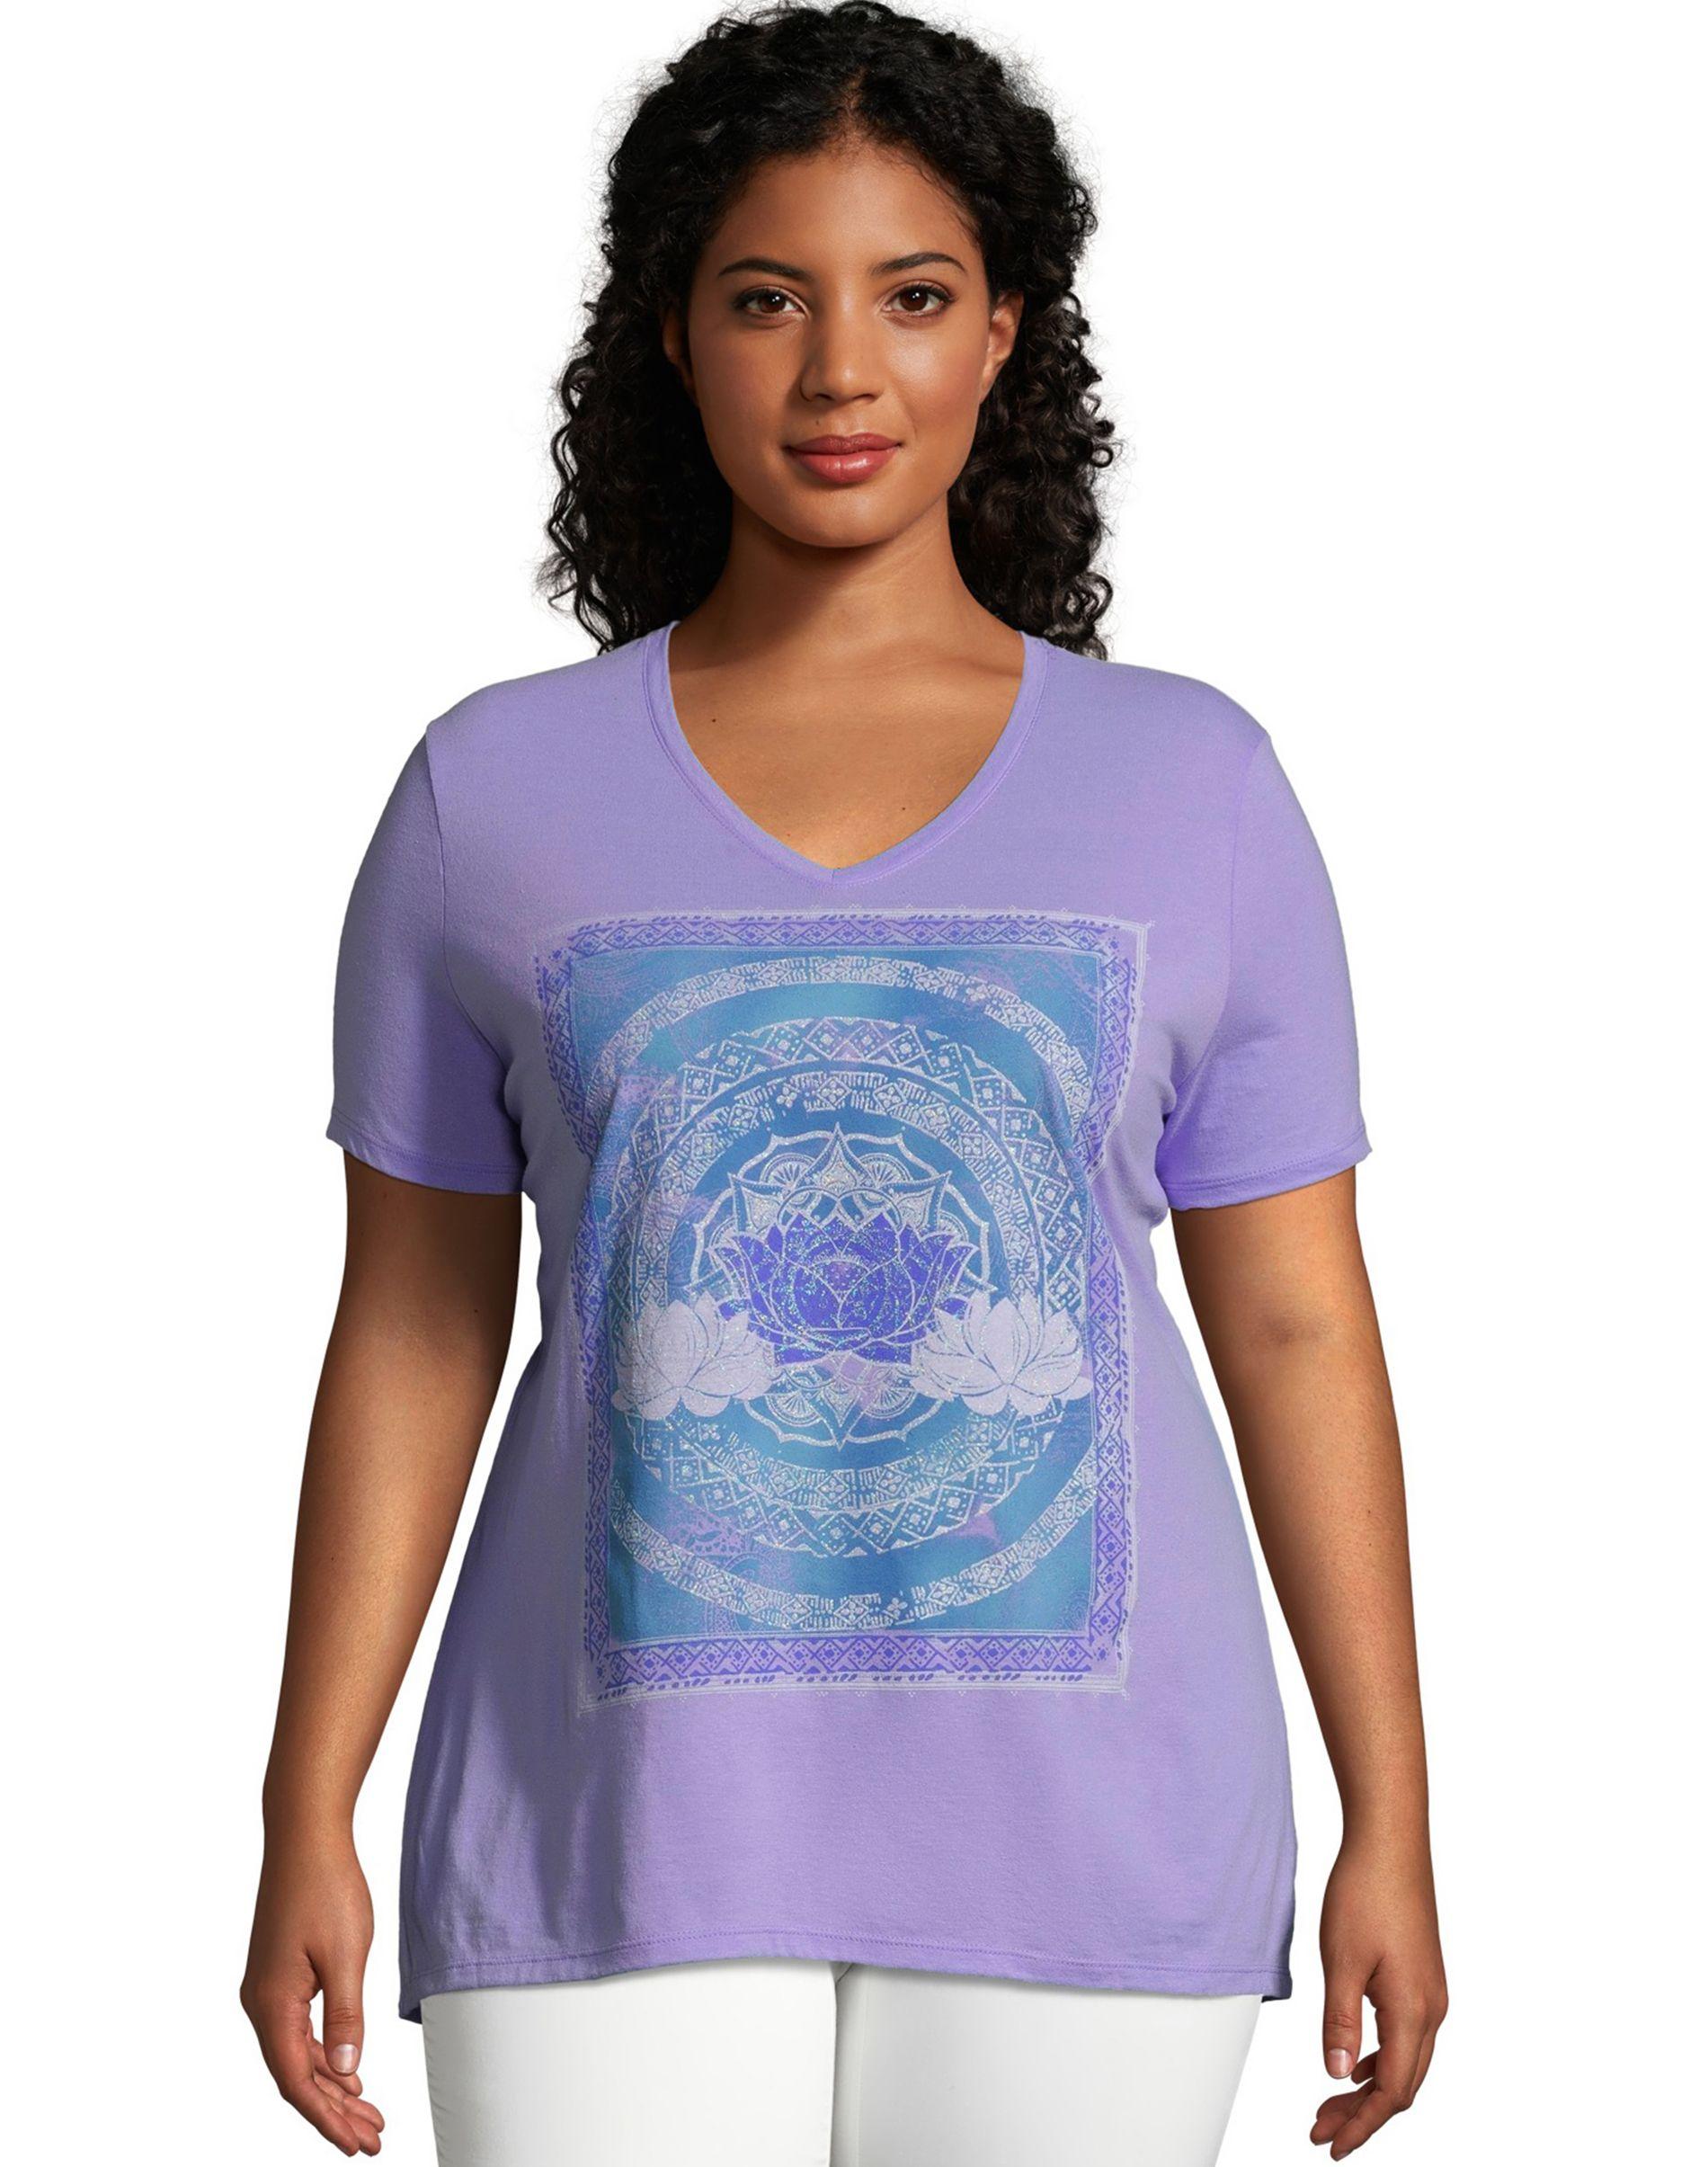 JMS Lotus Love Short Sleeve Graphic Tee women Just My Size